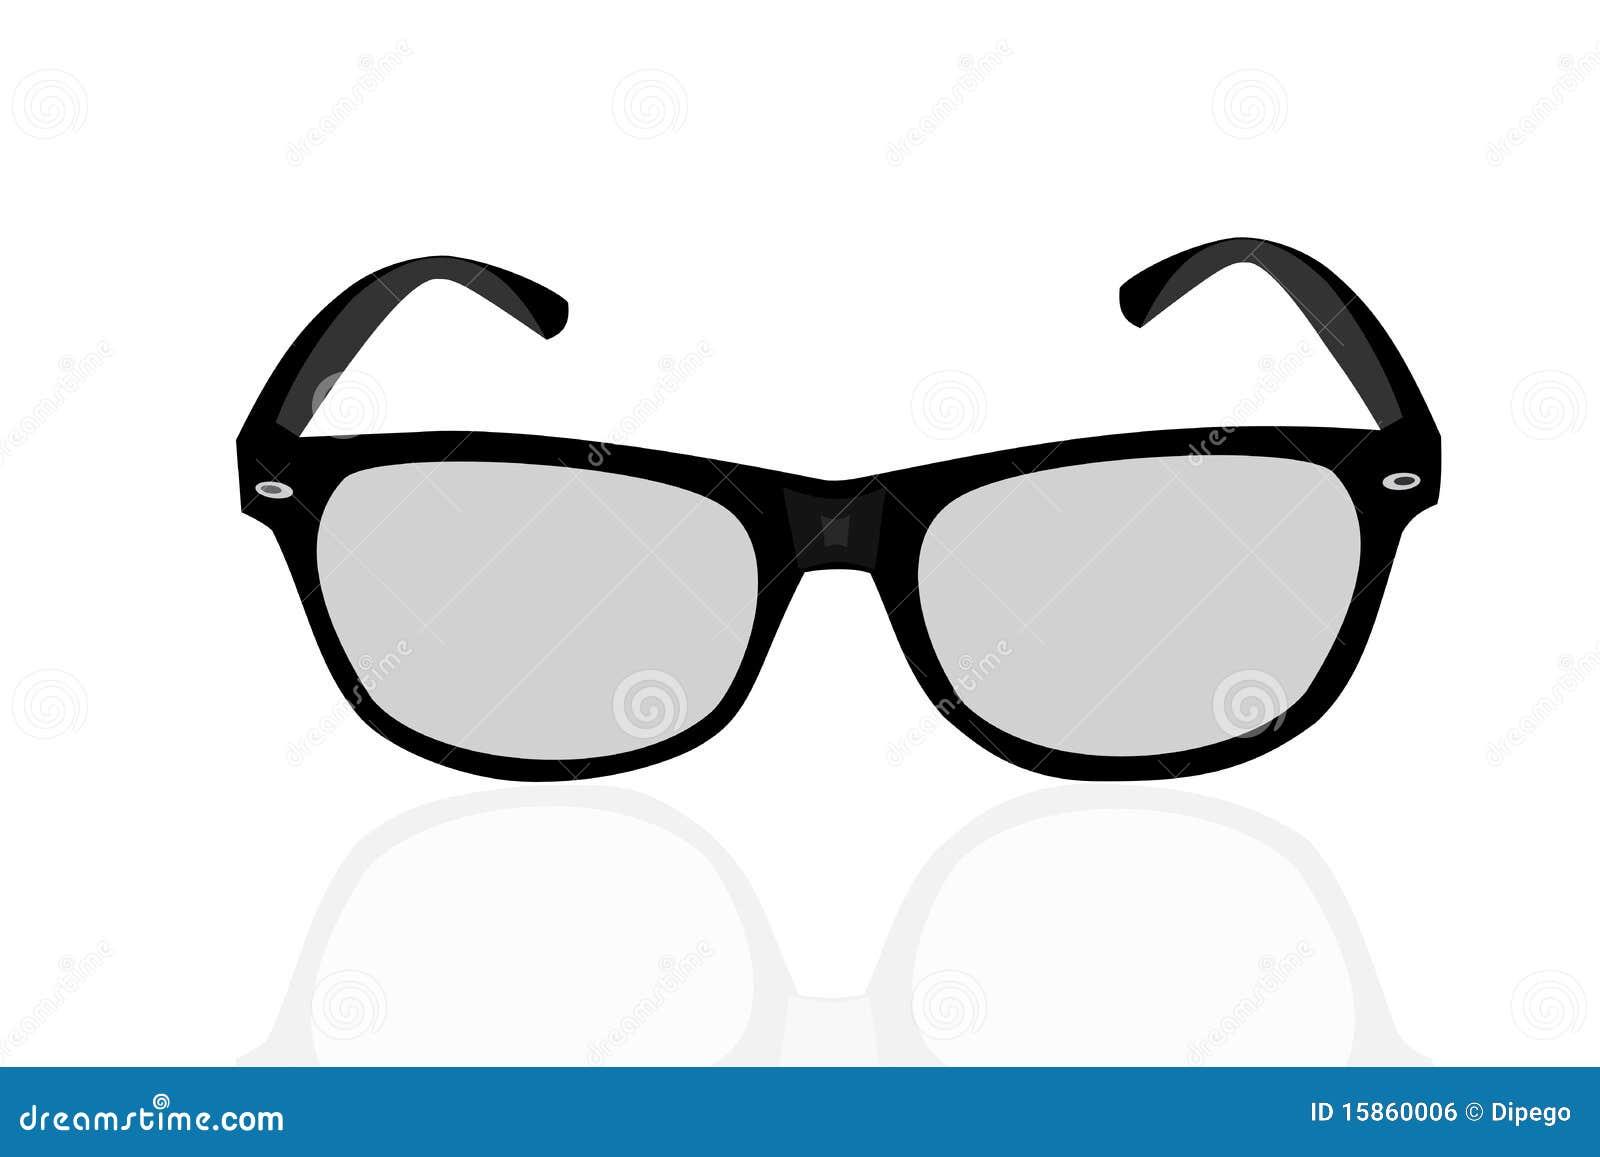 3d Glasses, Illustration Royalty Free Stock Image - Image ...